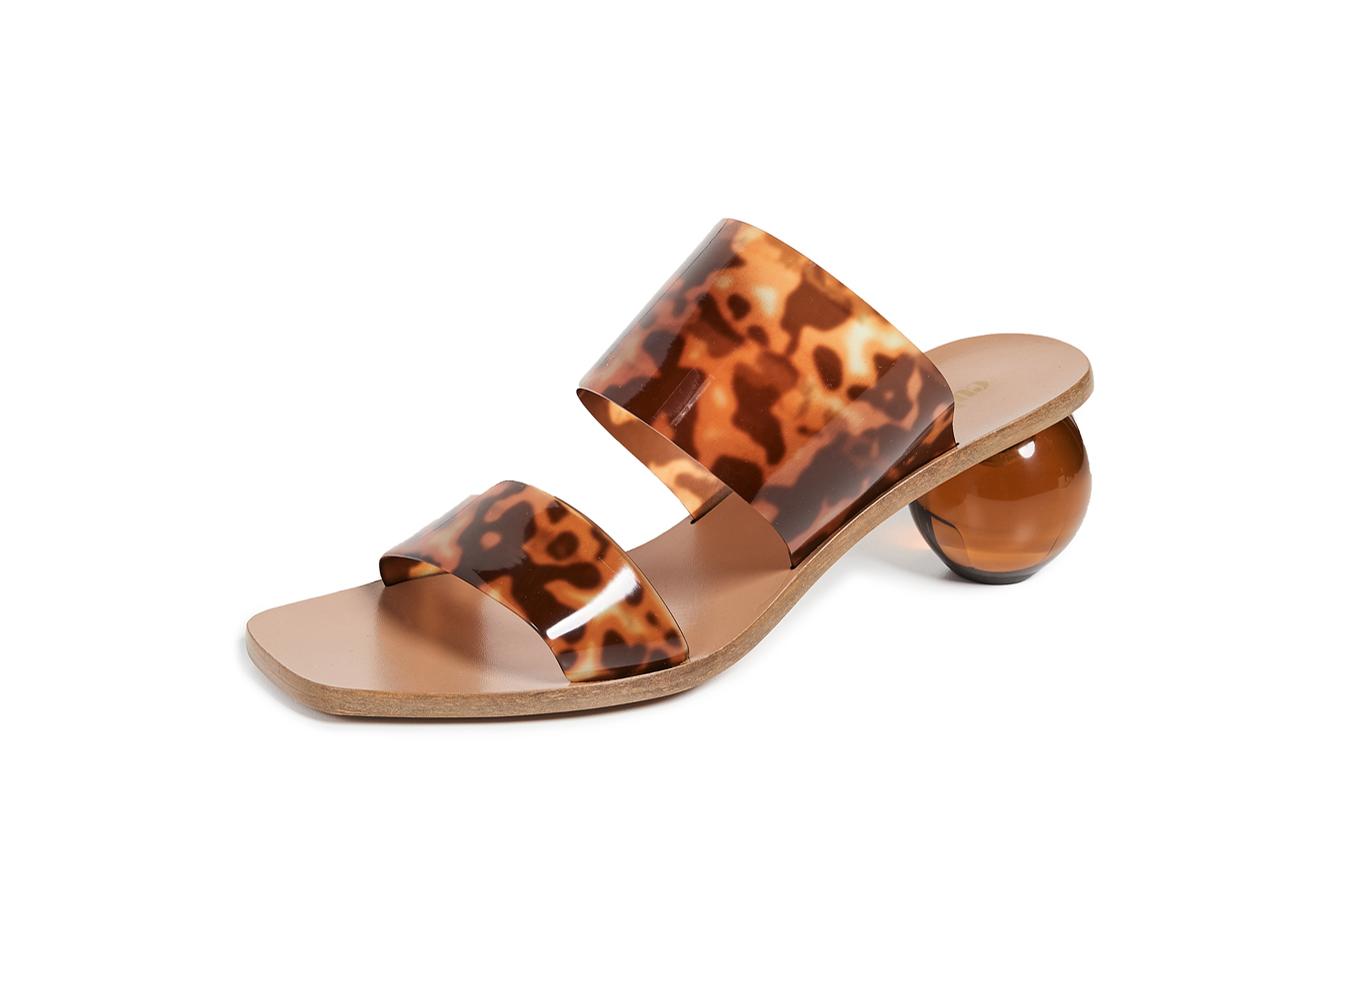 Cult Gaia Jila Heel Slide Sandals